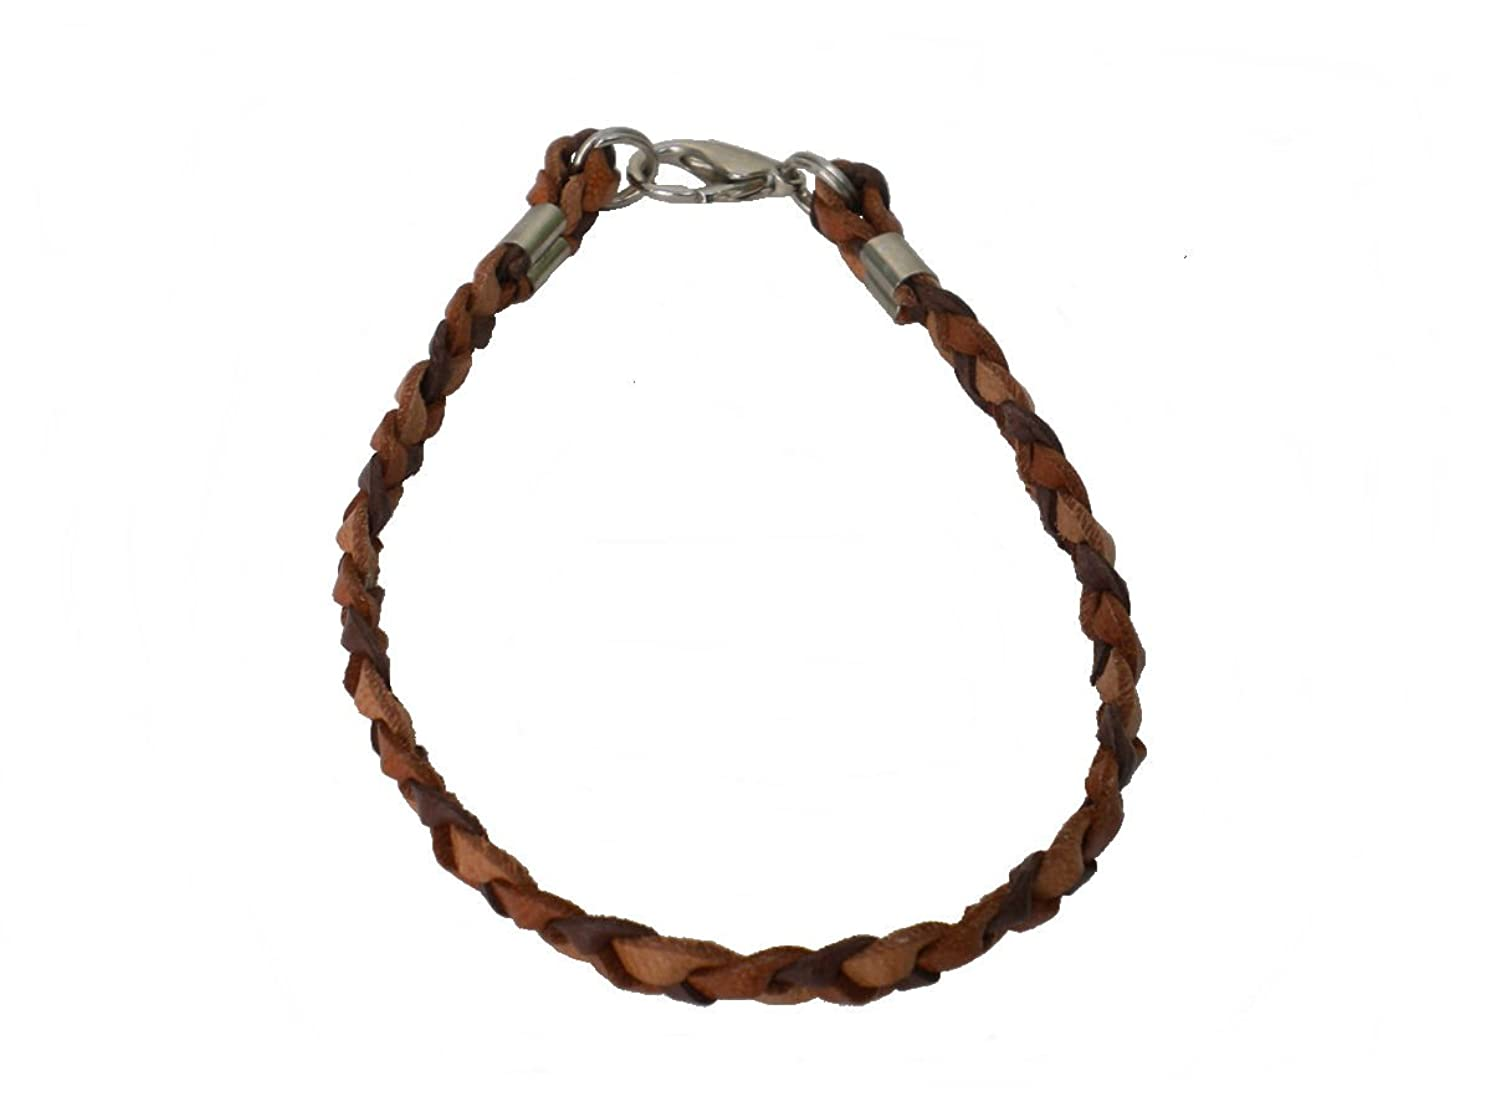 Bracelet/Anklet Braided Leather Mens or Womens 1/4